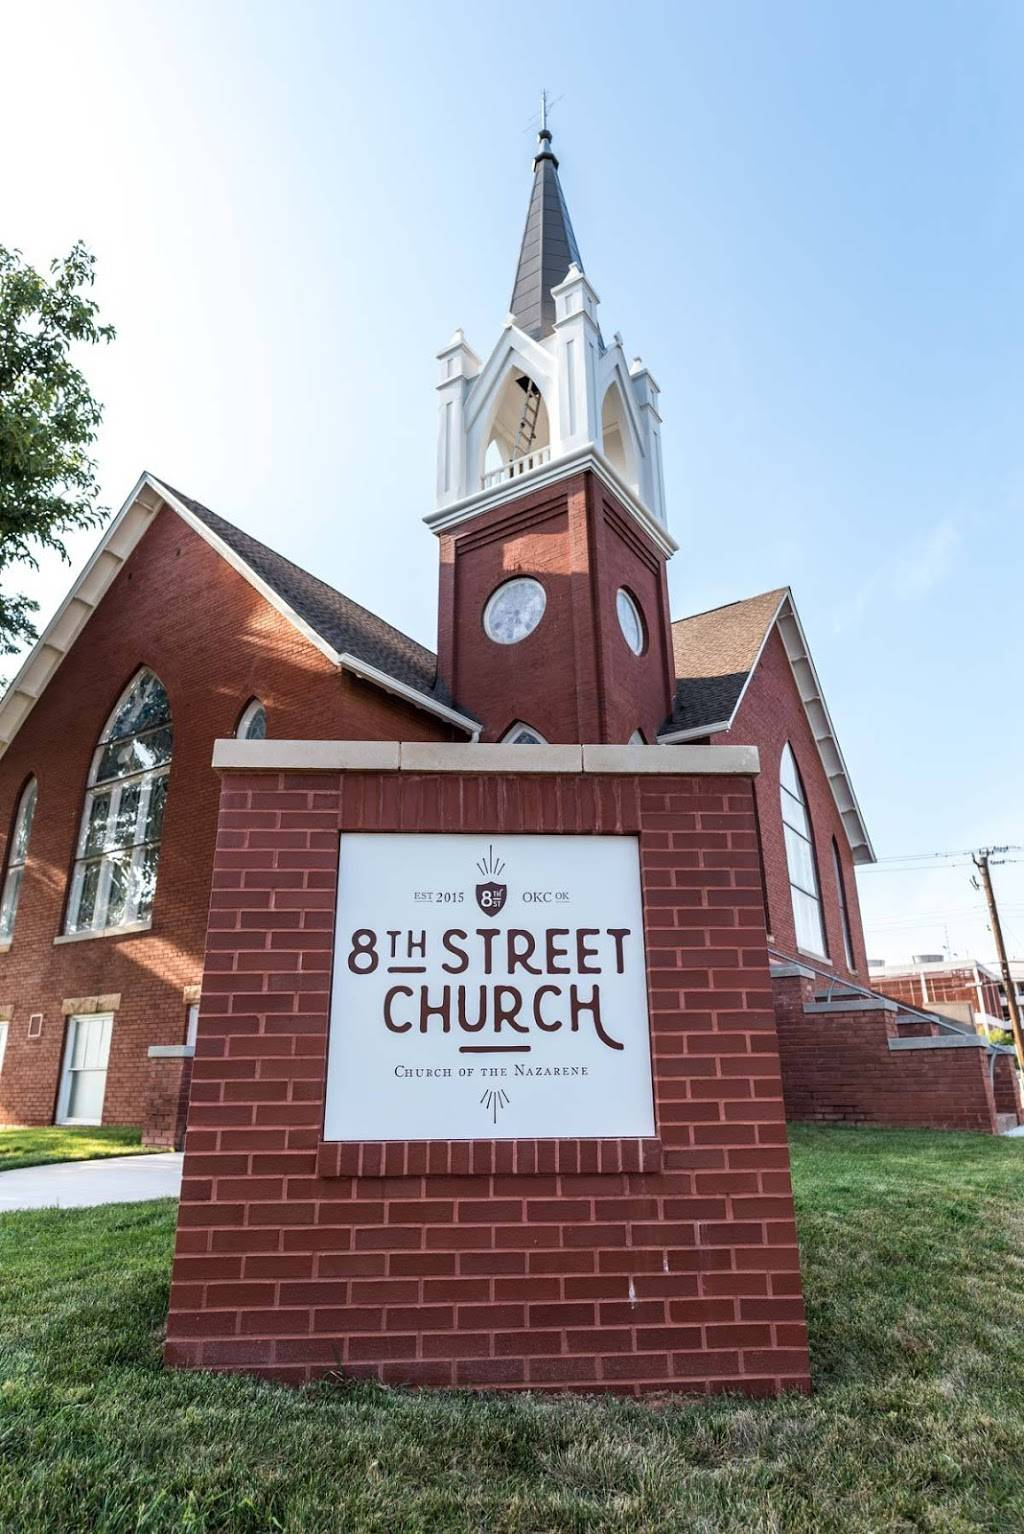 8th Street Church of the Nazarene - church    Photo 10 of 10   Address: 701 NW 8th St, Oklahoma City, OK 73102, USA   Phone: (405) 896-0283